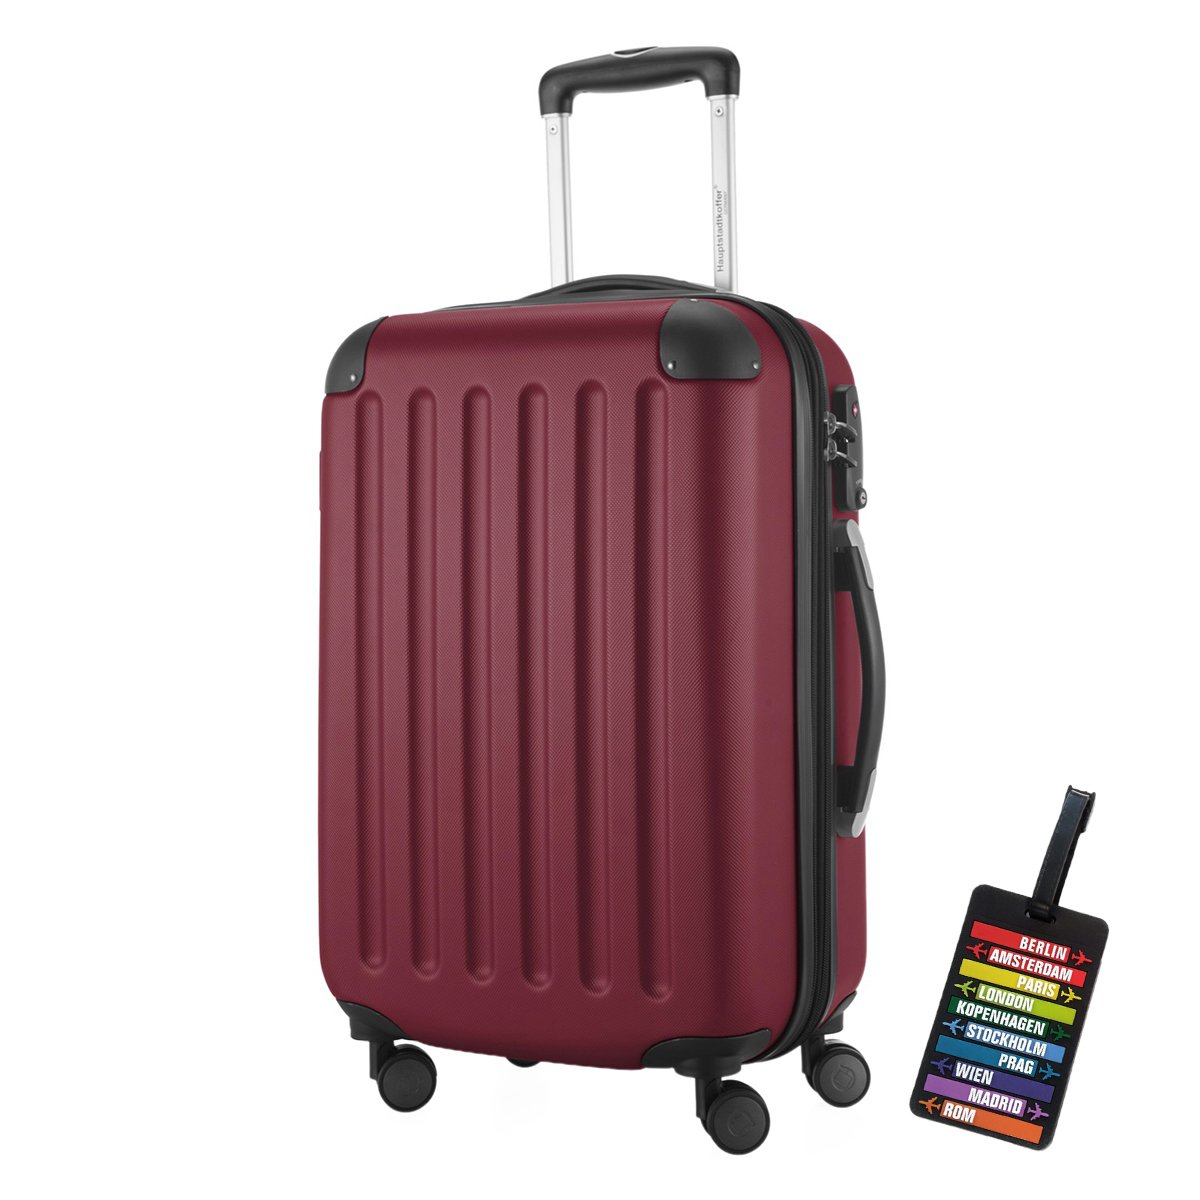 Hauptstadtkoffer Valise Spree 55/20, 55cm, 42 L, Bourgogne, + étiquette de bagage HK1203-BG-49-SALE+KA